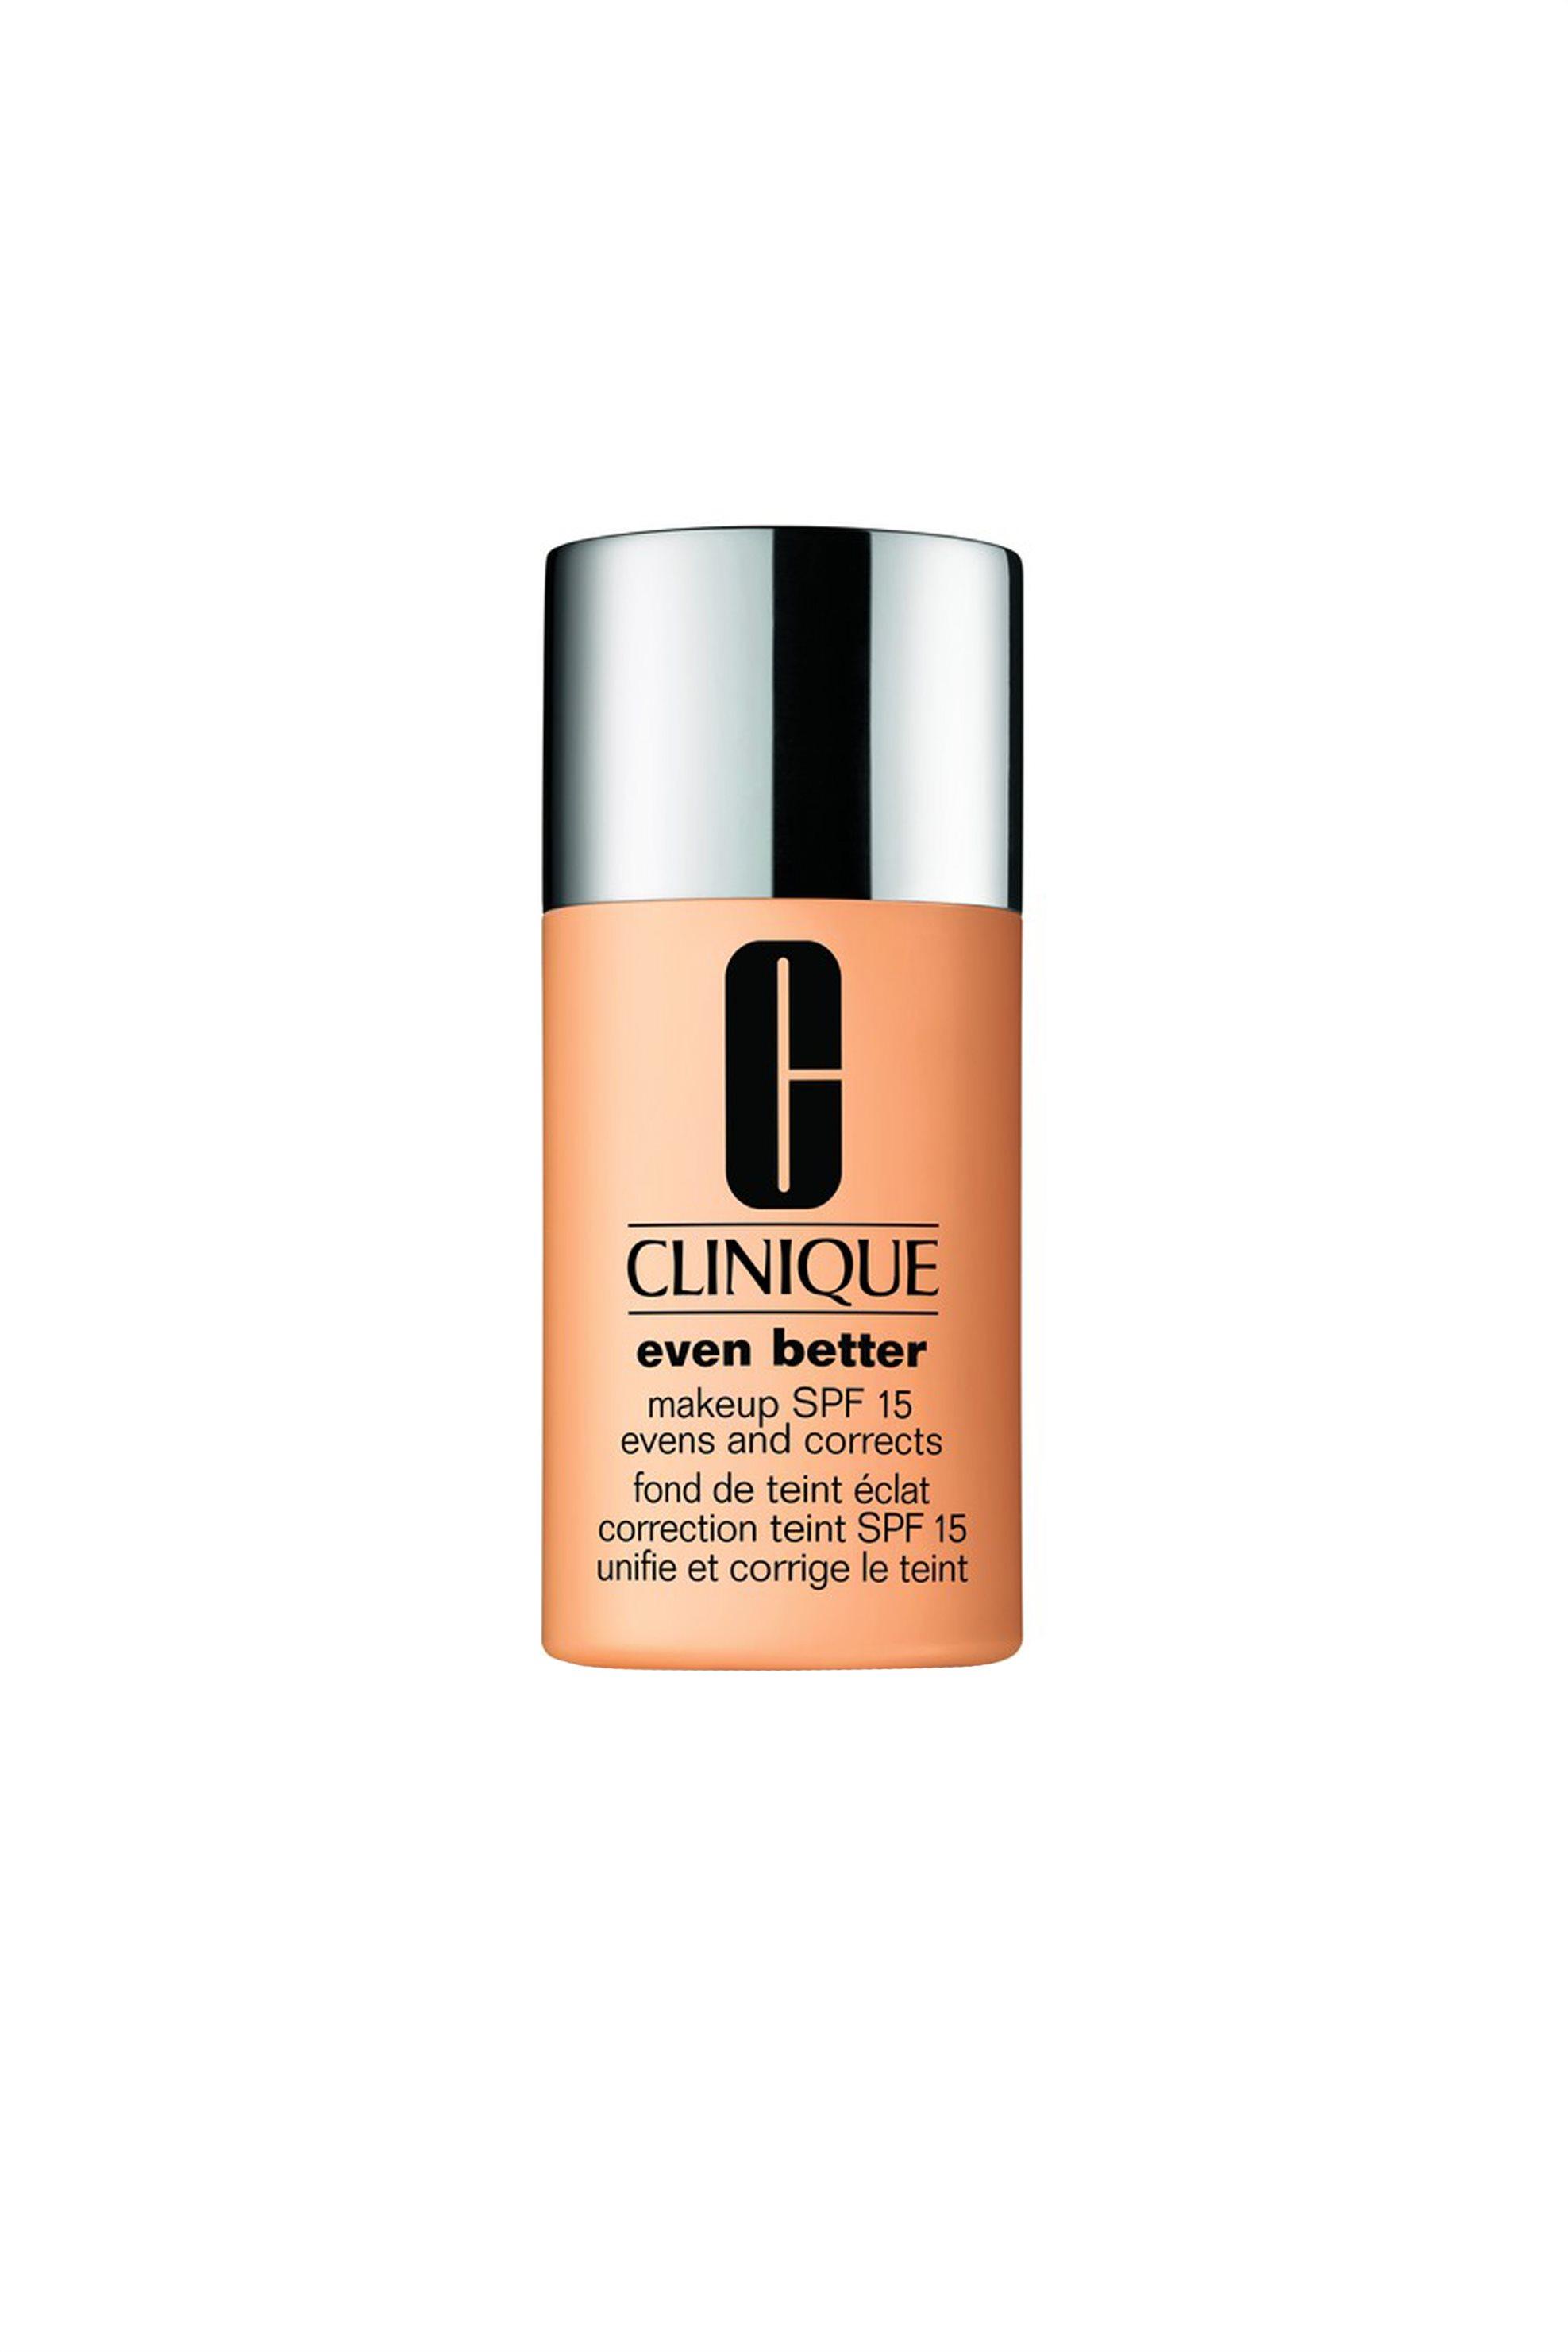 Clinique Even Better™ Makeup SPF 15 WN 68 Brulee 30 ml - 6MNY35A000 ομορφια   καλλυντικα επιλεκτικησ   μακιγιάζ   πρόσωπο   make ups   foundations